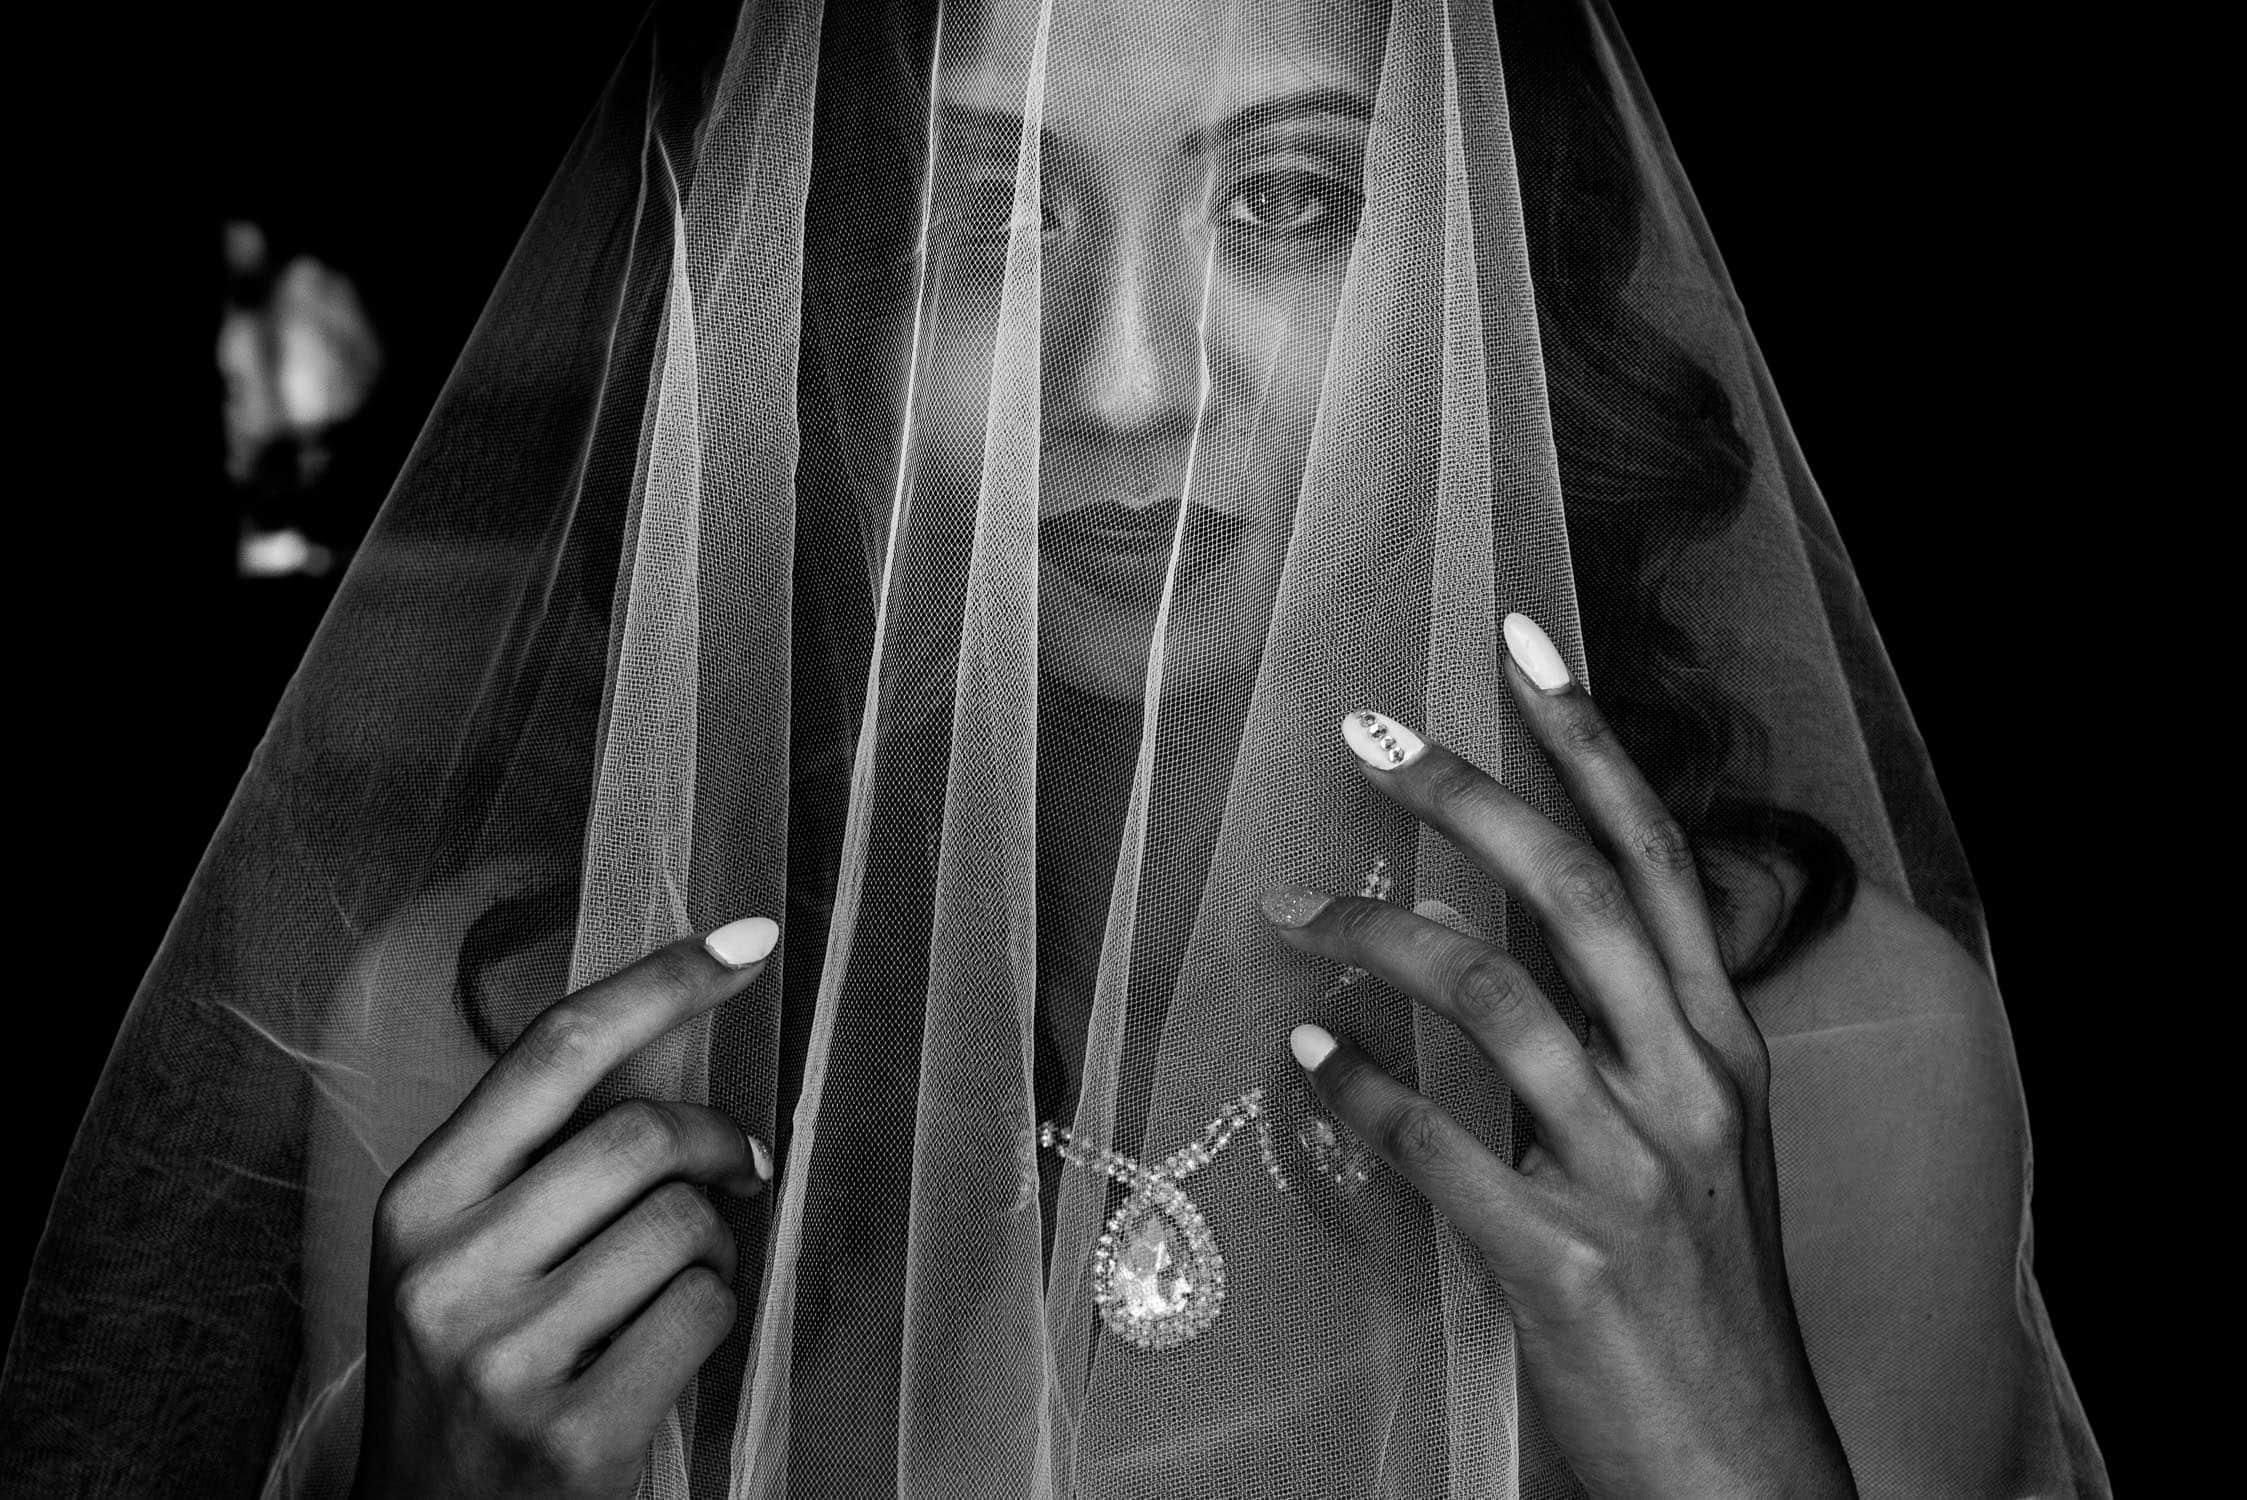 Bride holding veil black & white wedding photography